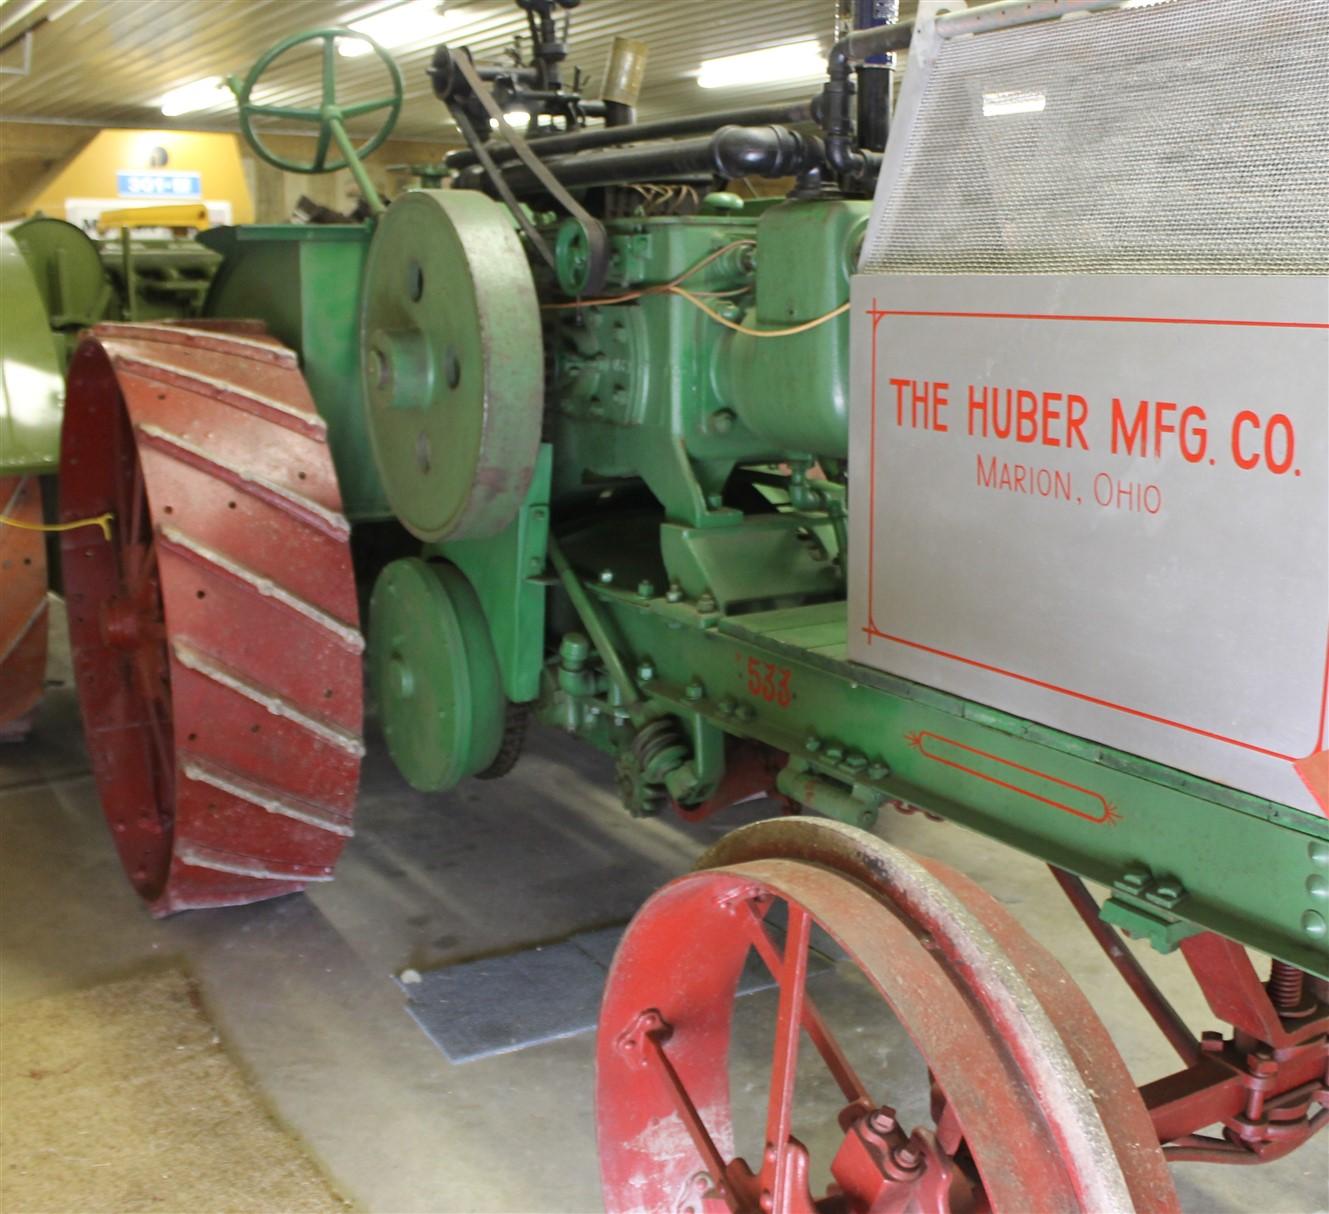 2015 04 18 168 Marion OH Huber Mfg Museum.jpg